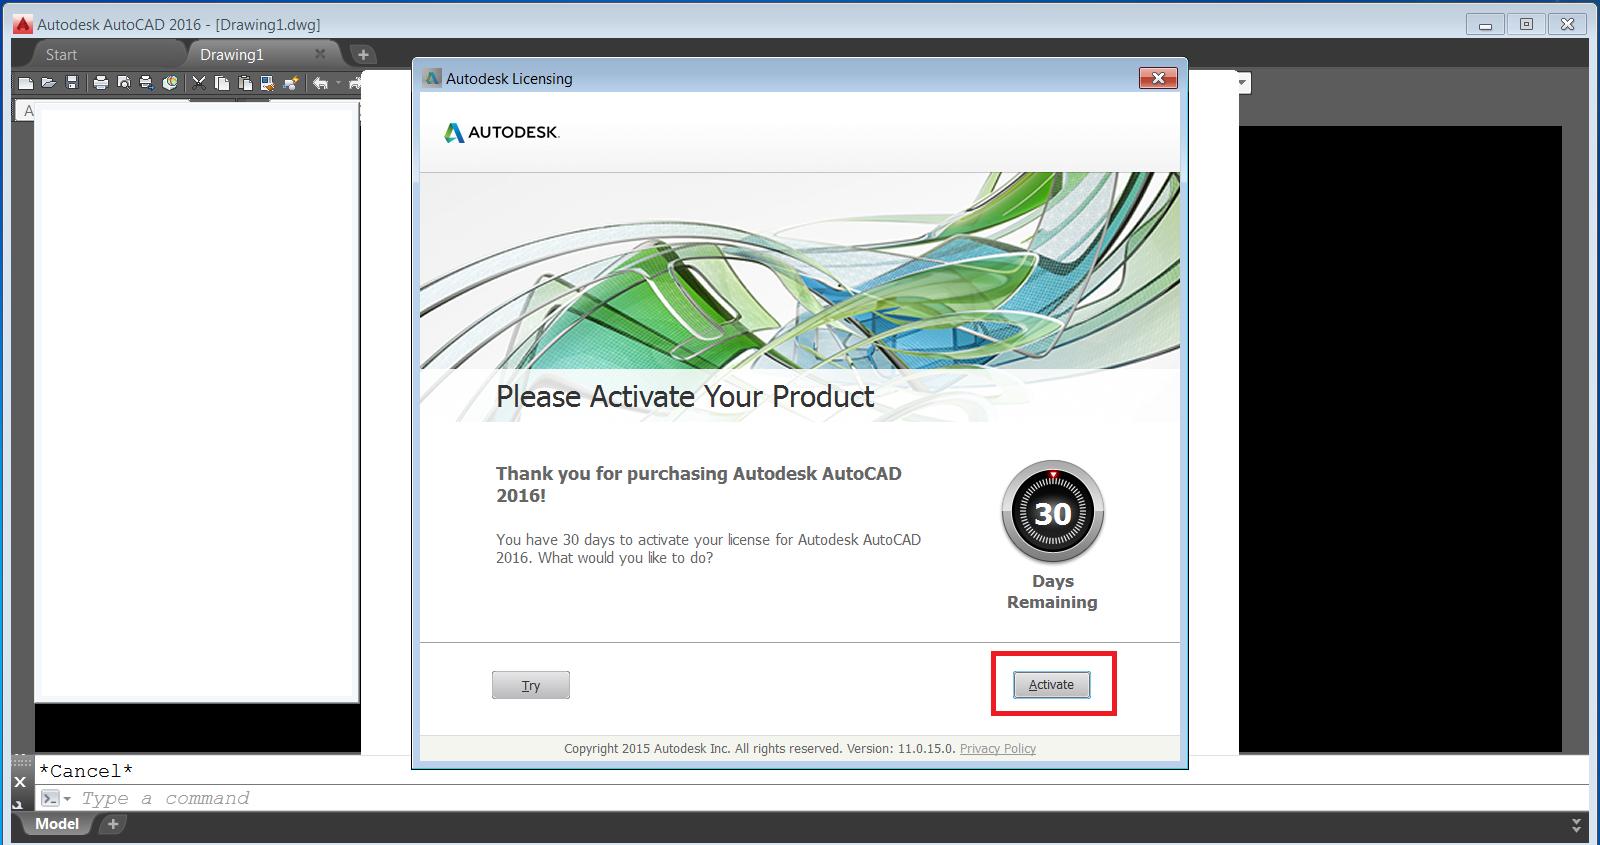 autocad 2016 download full version 32-bit